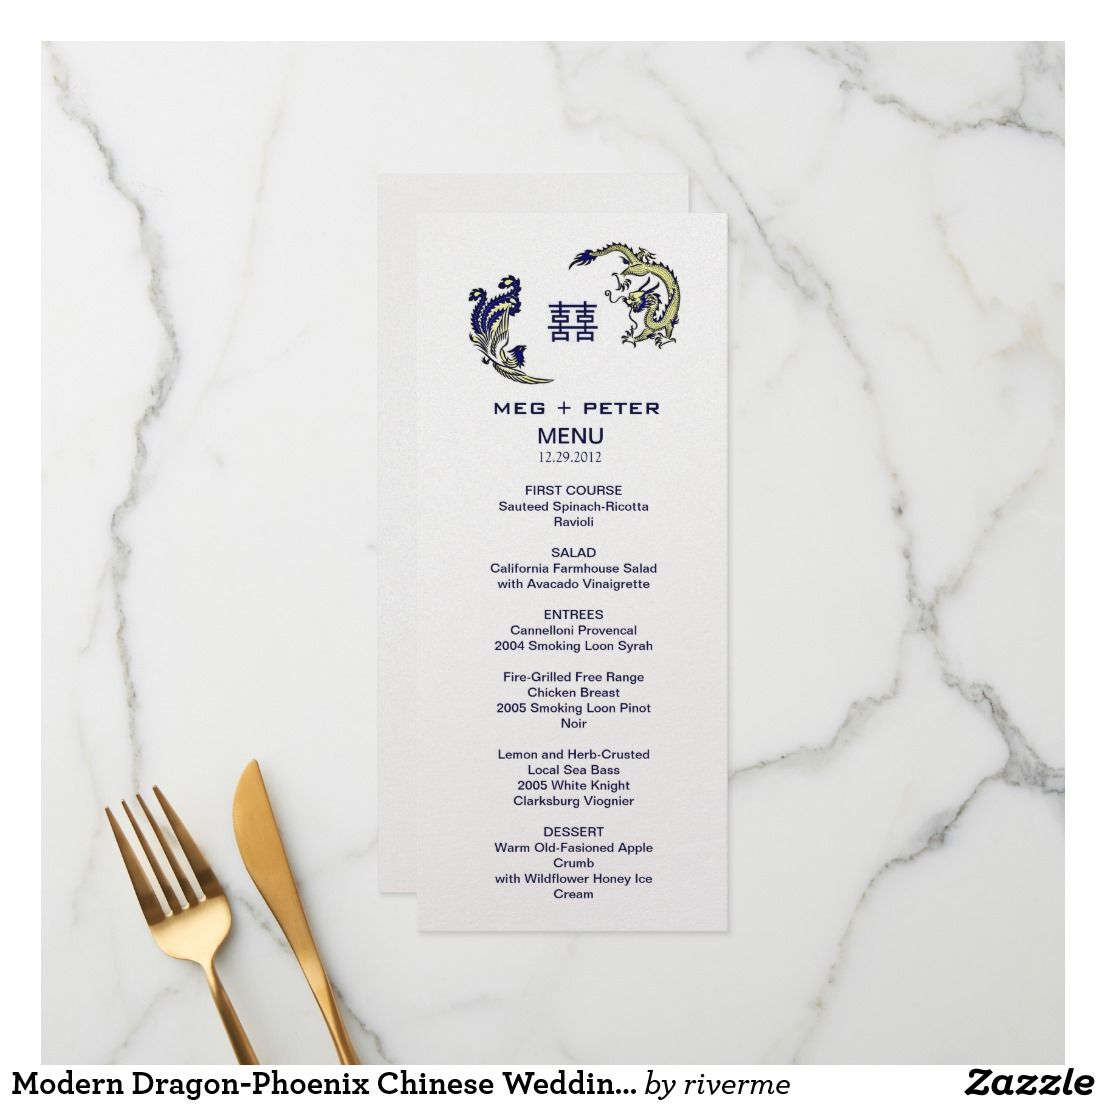 Chinese Wedding Food Menu: Modern Dragon-Phoenix Chinese Wedding Menu